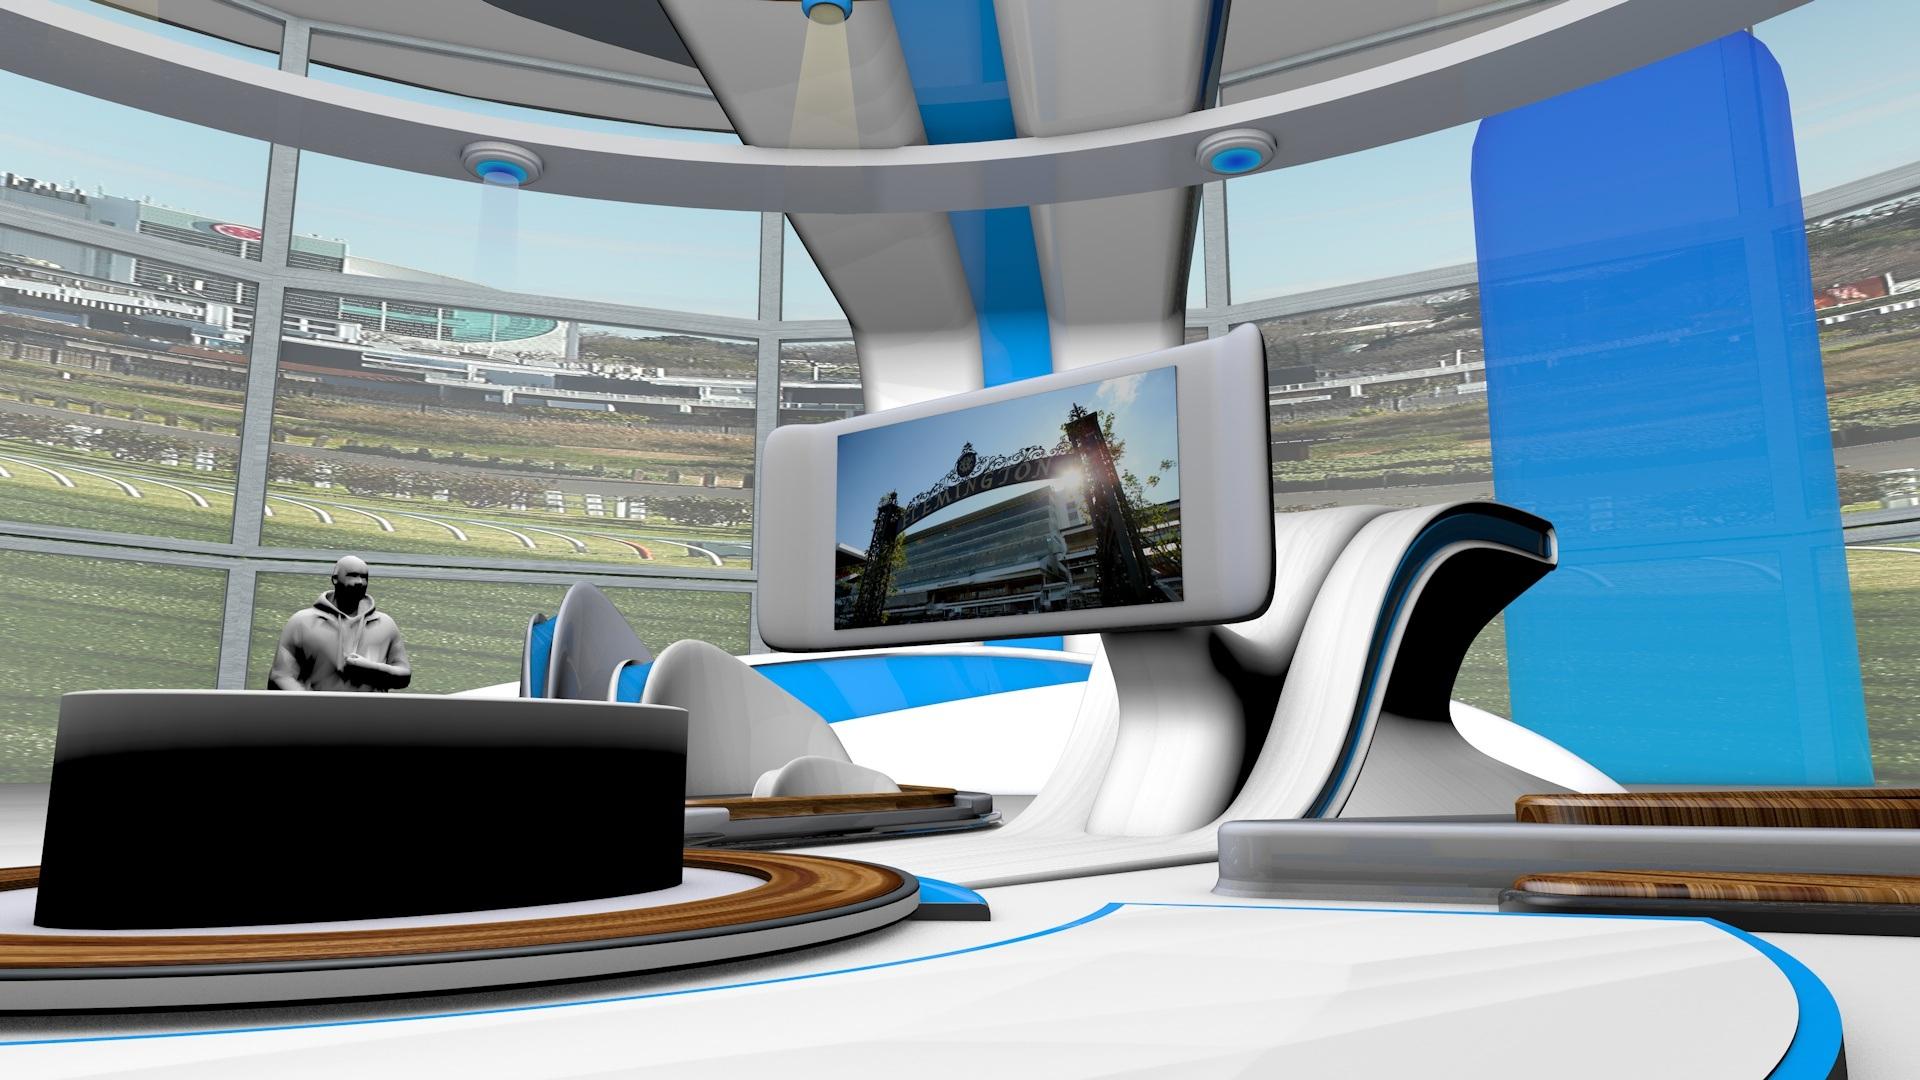 Crown Bet Virtual sets - orbitvfx